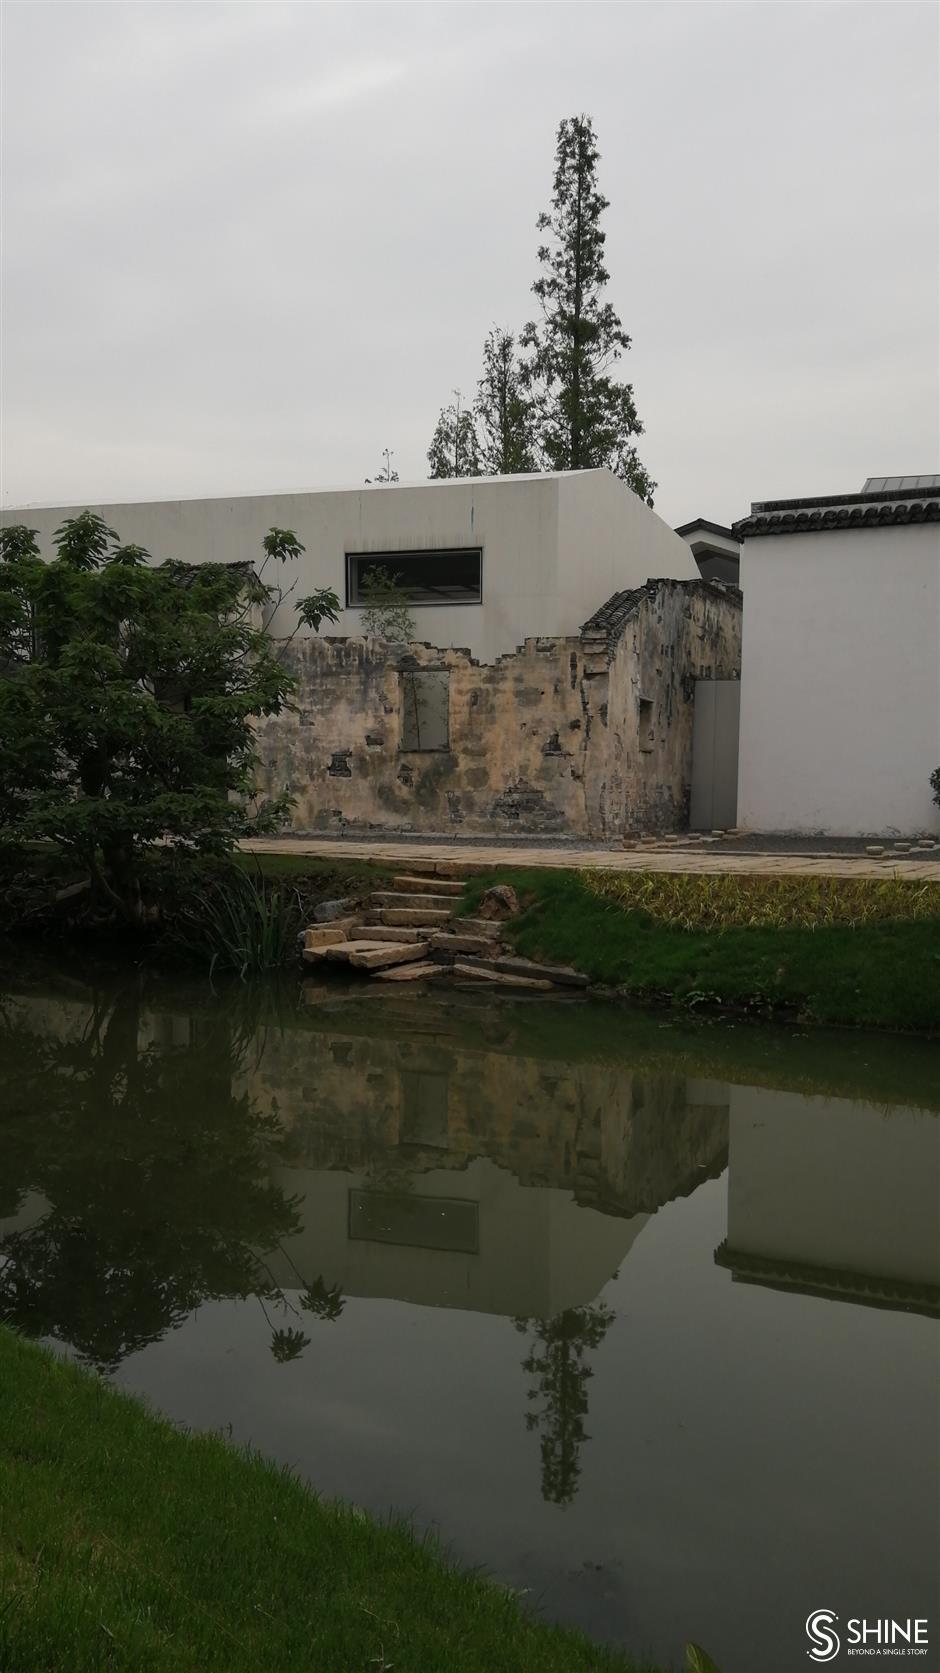 Village pioneers a new type of urbanization